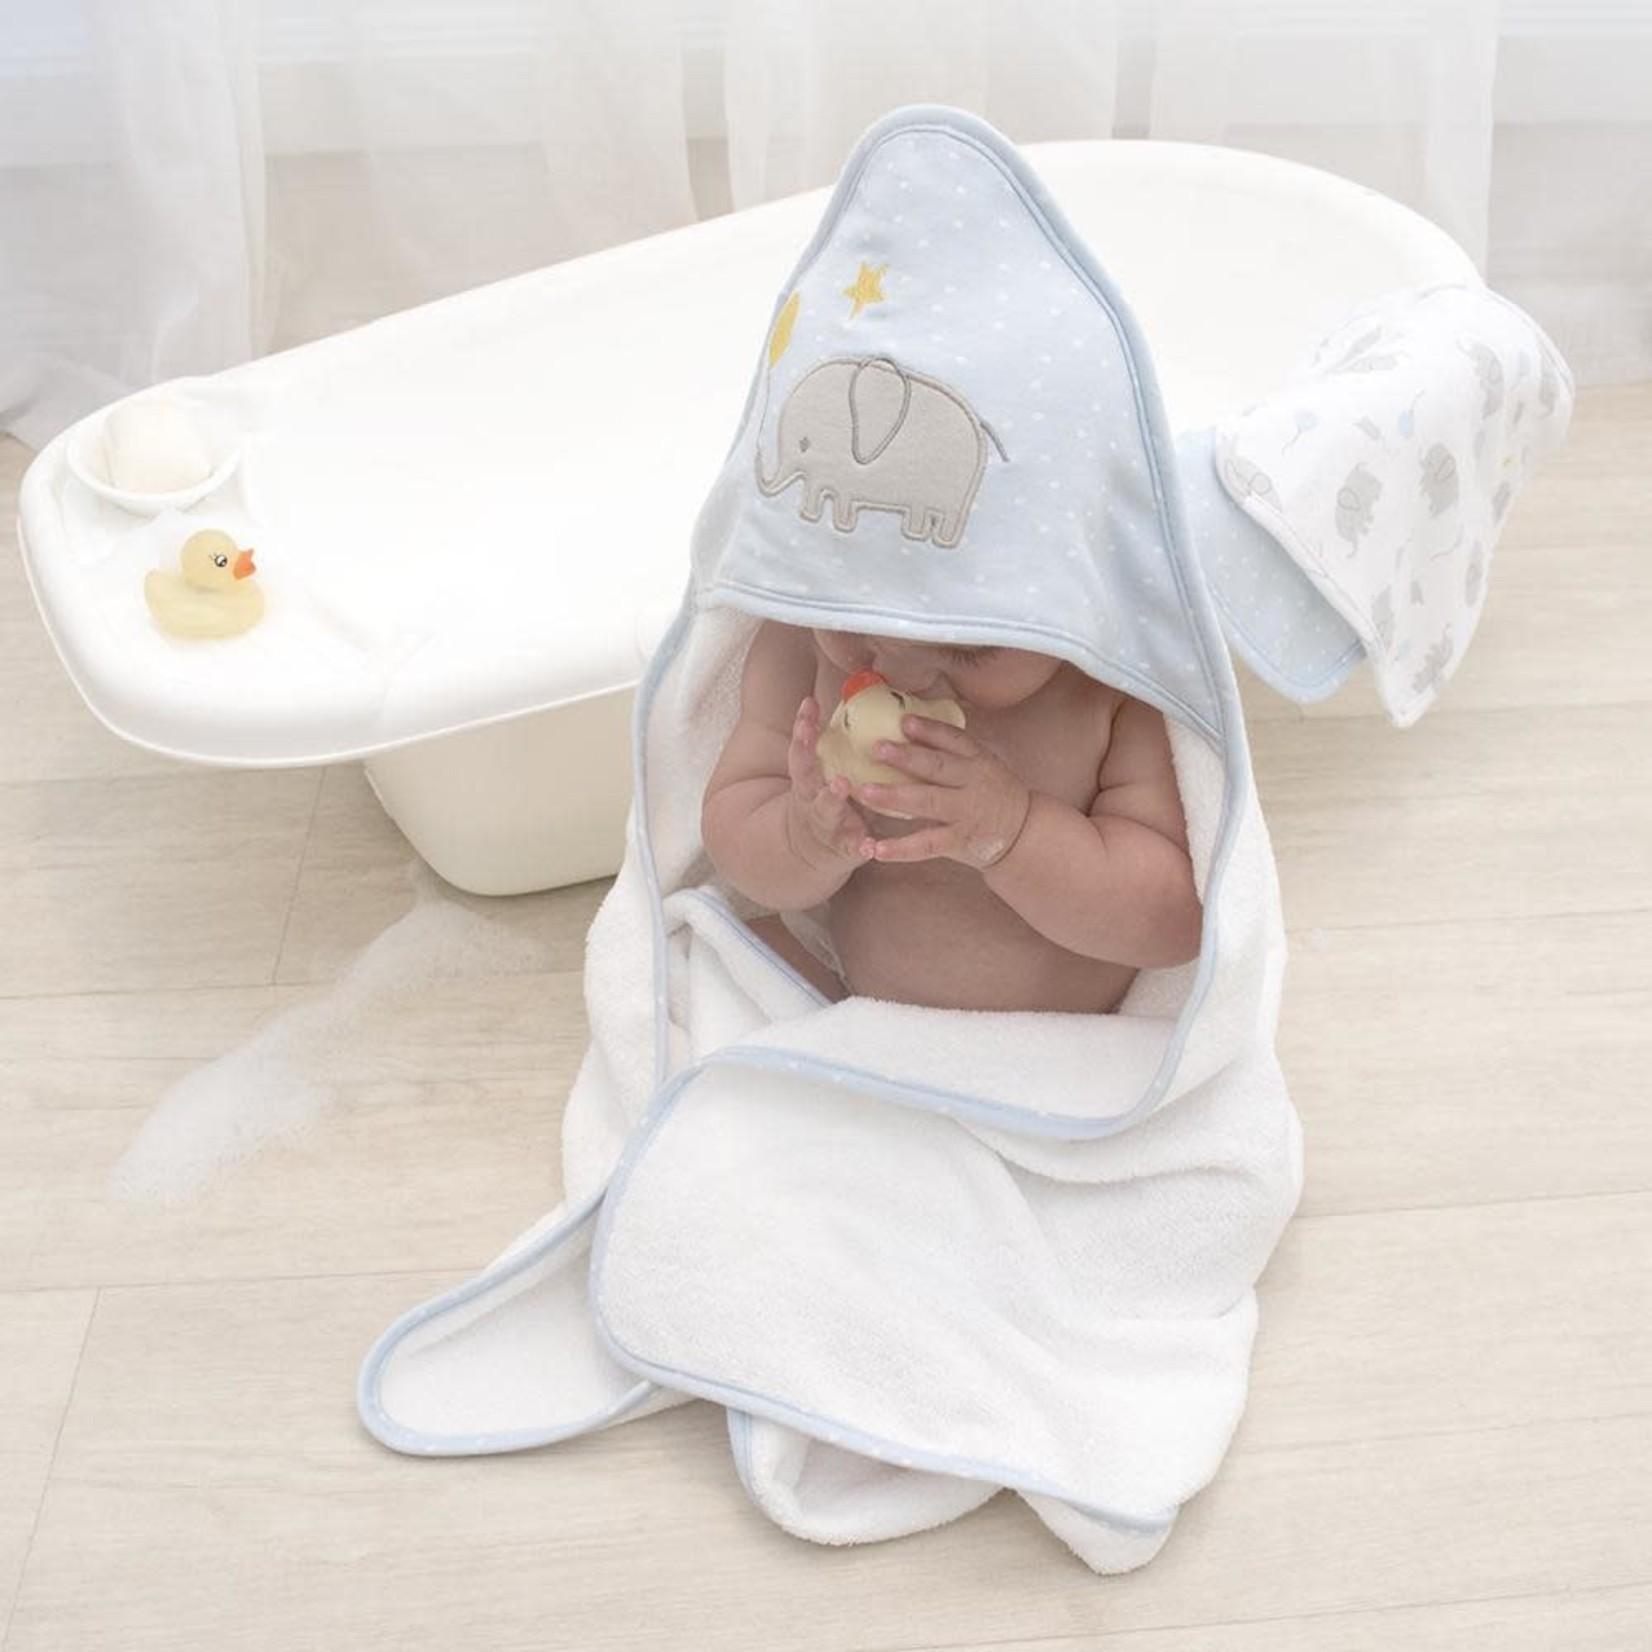 Lively Living Living Textiles Hooded Towel - Mason Elephant